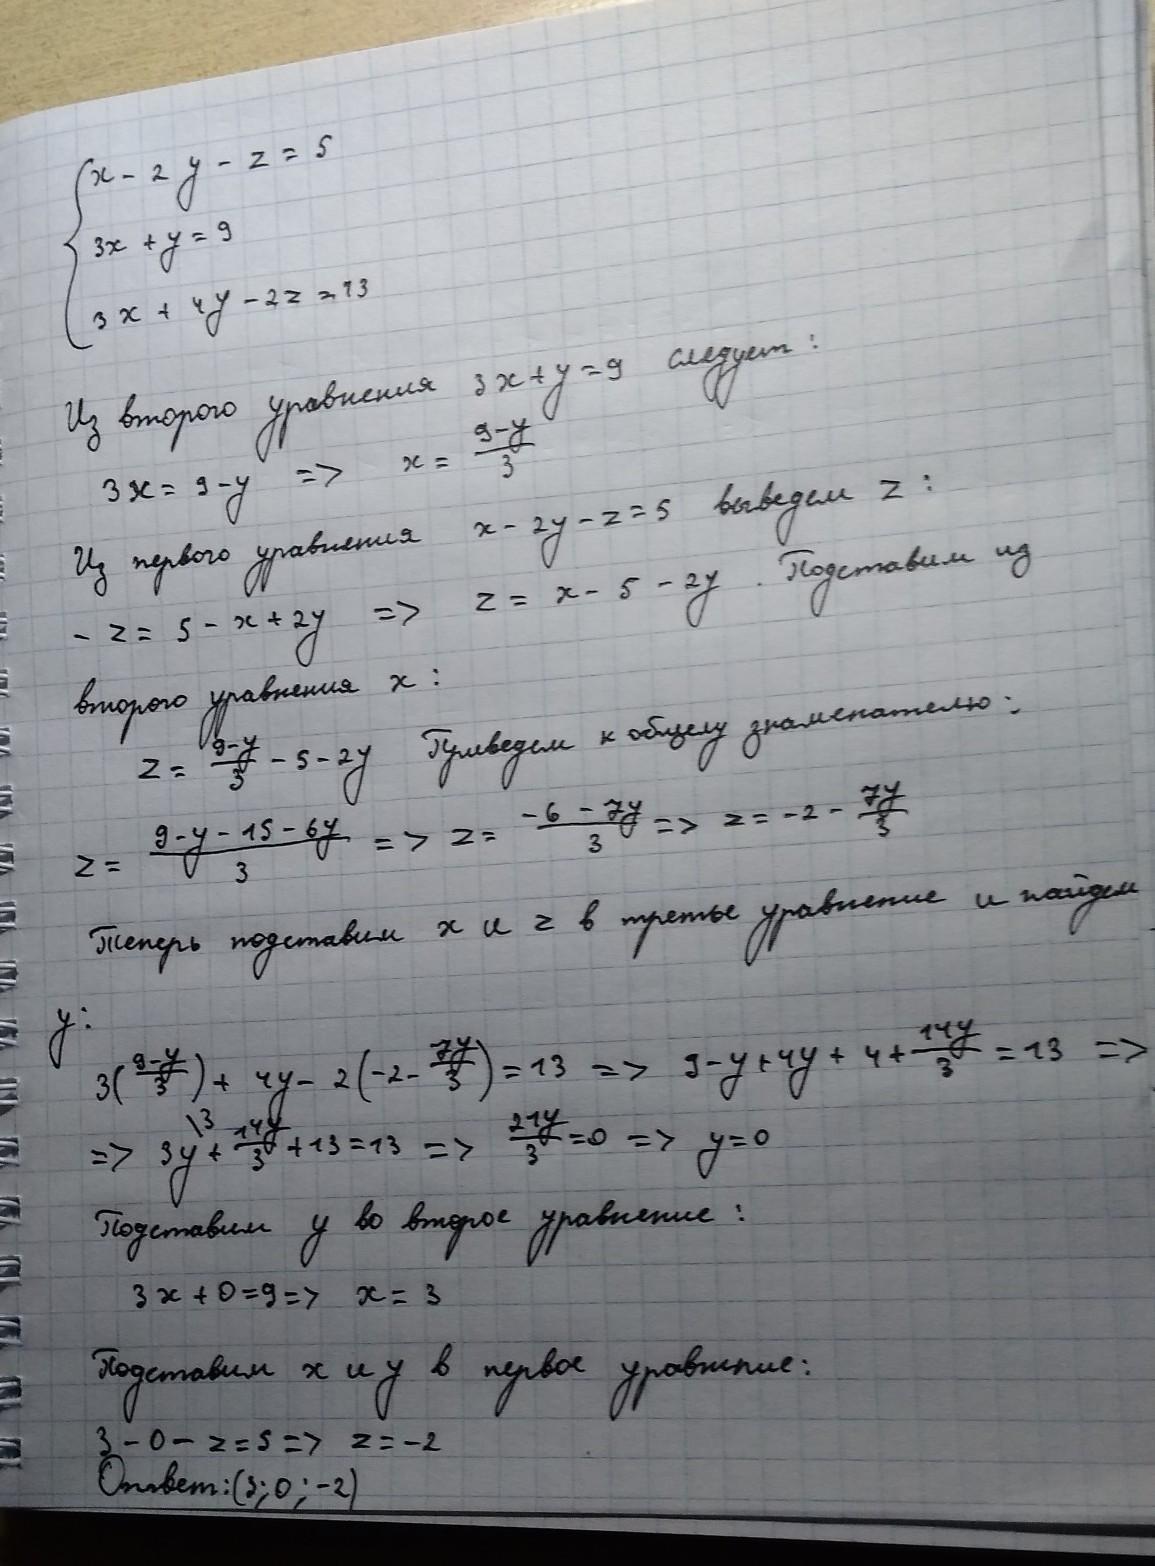 Помогите решить систему х-2y-z=5 3x+y=9